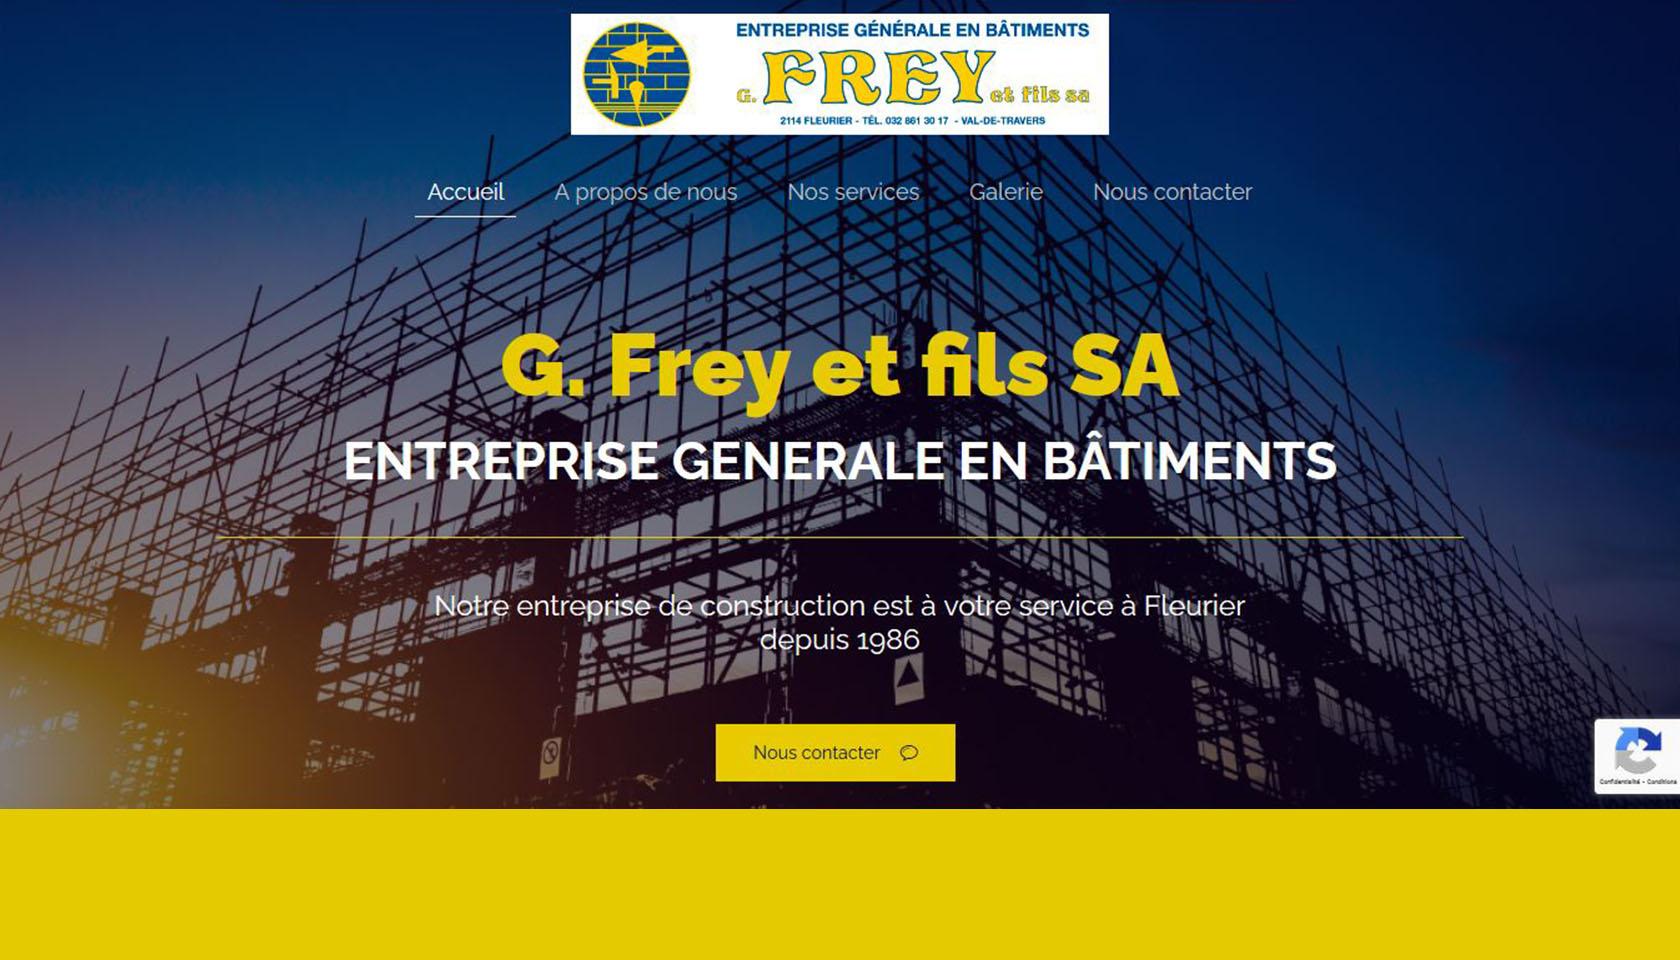 G. frey et Fils SA